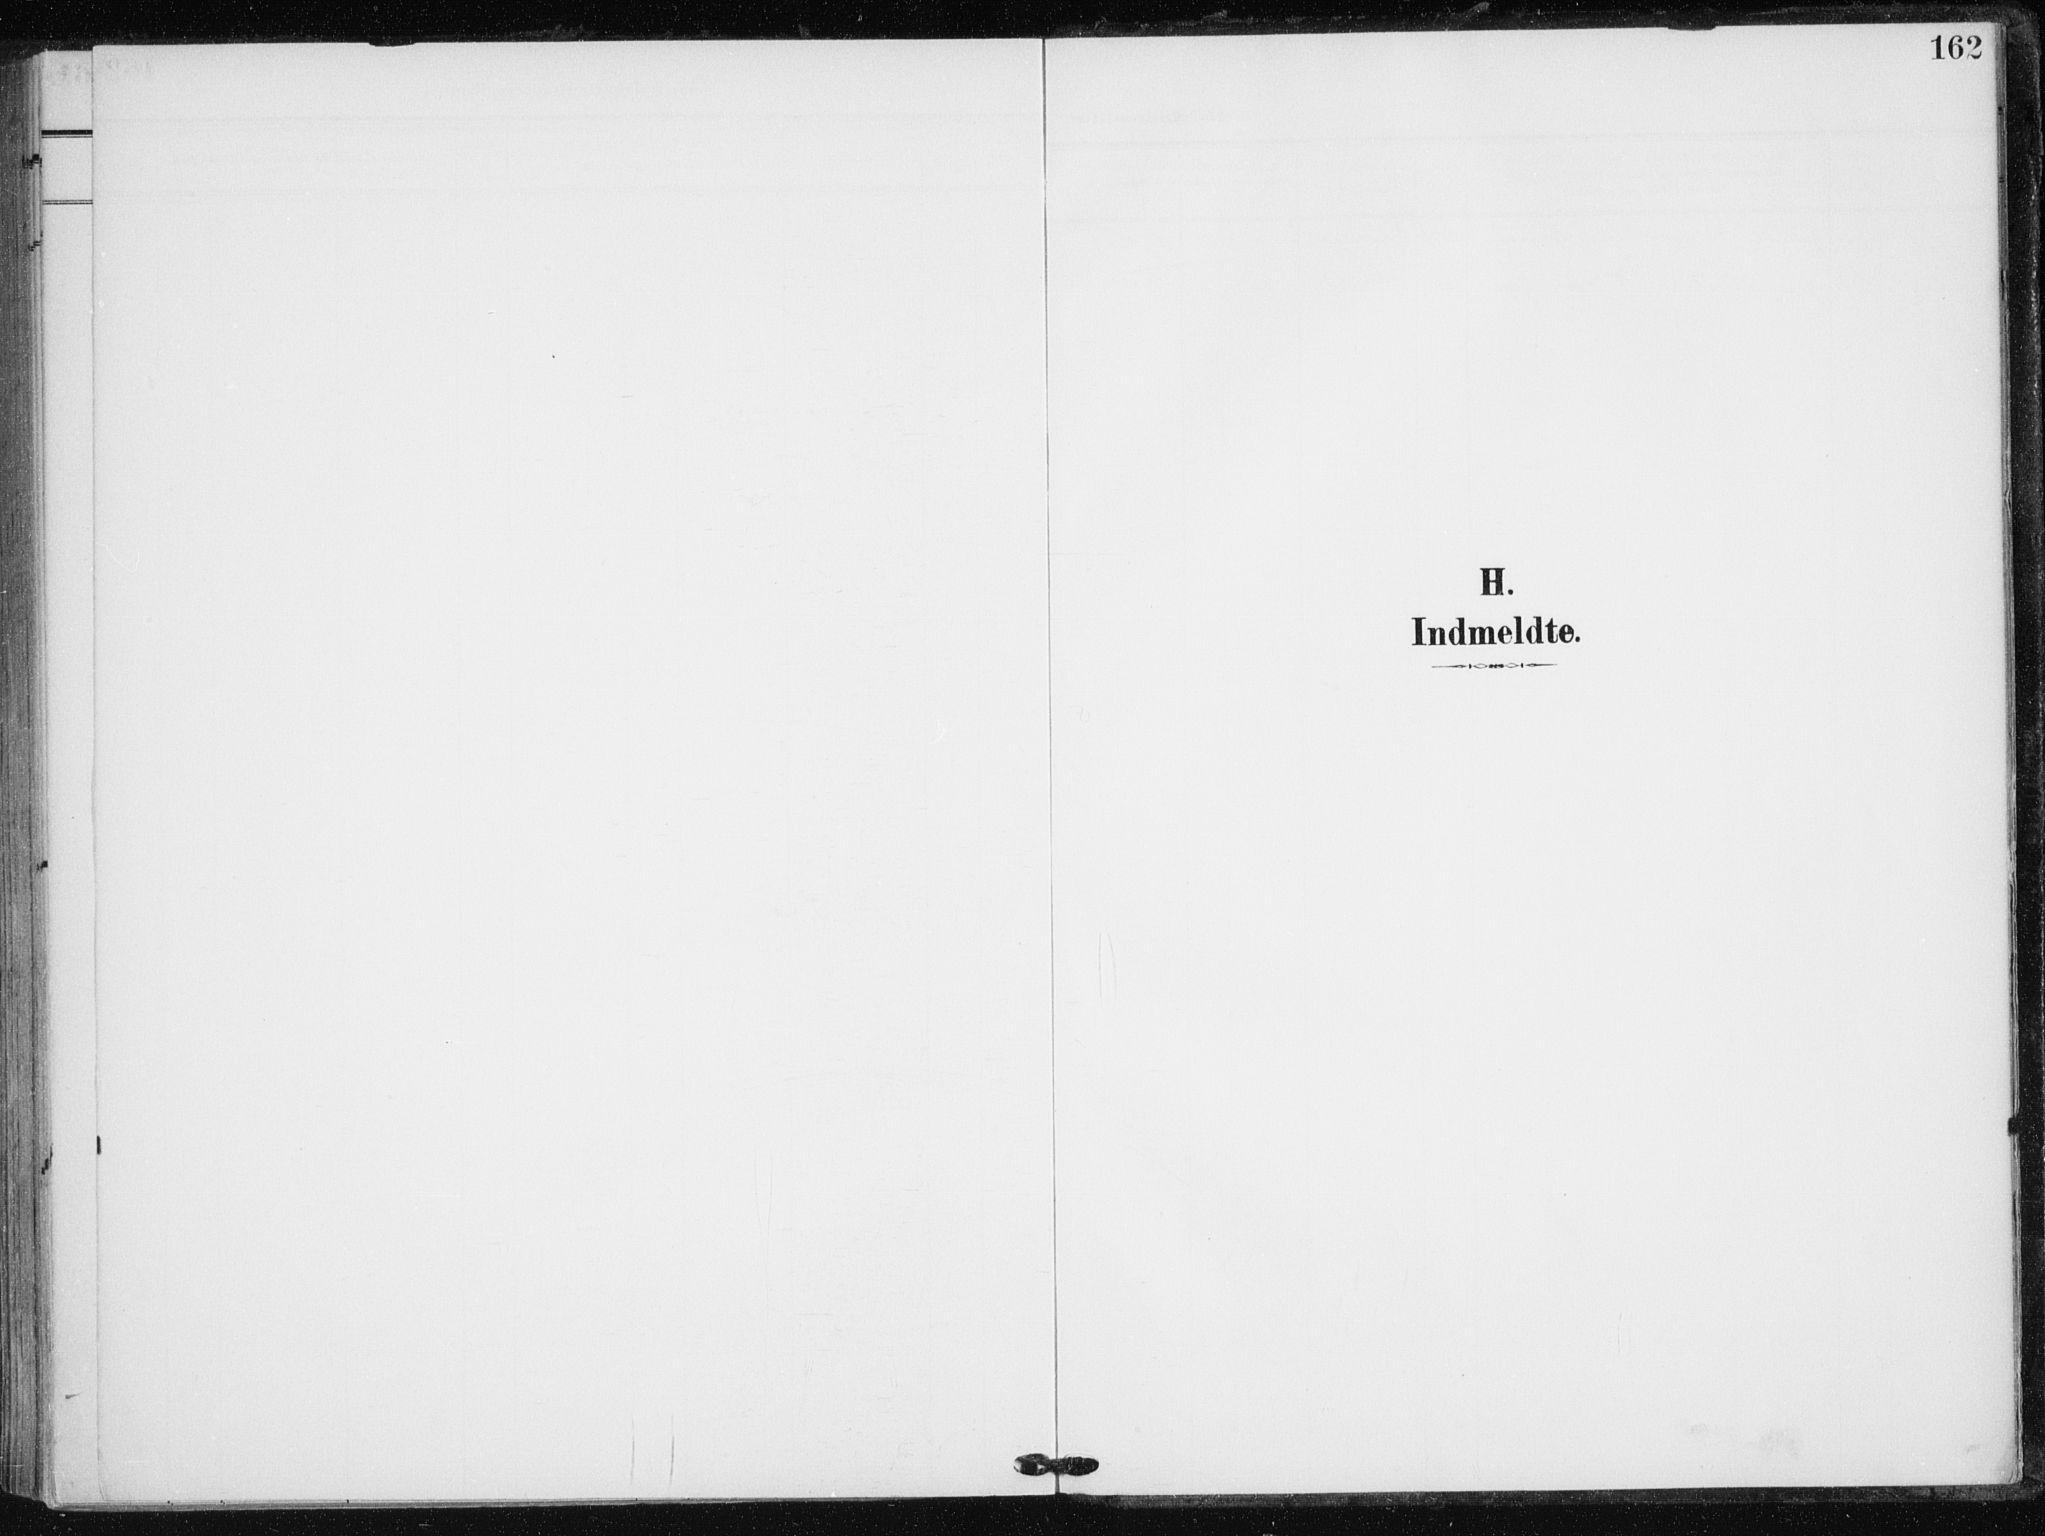 SATØ, Tranøy sokneprestkontor, I/Ia/Iaa/L0013kirke: Ministerialbok nr. 13, 1905-1922, s. 162